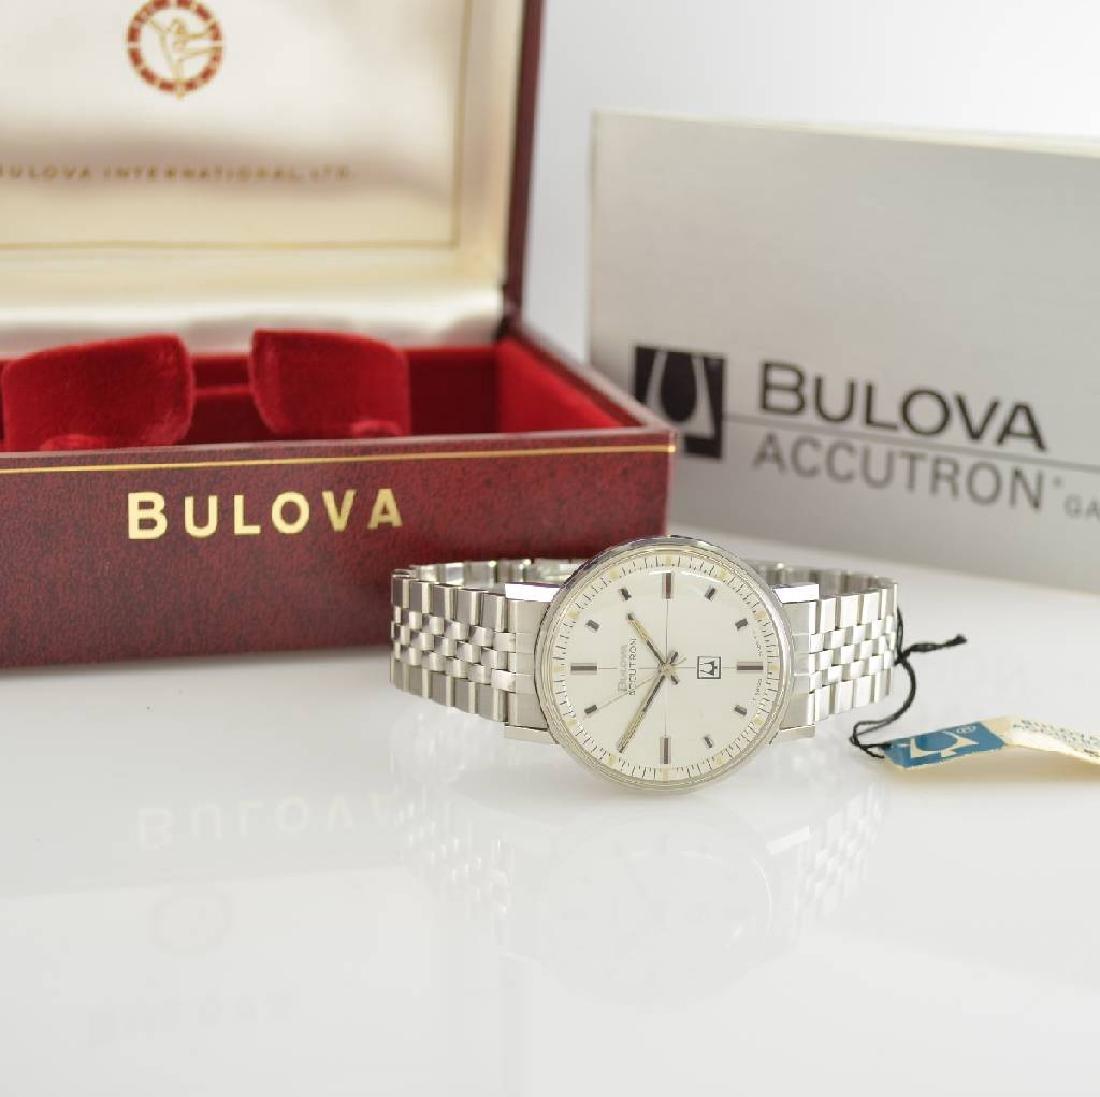 BULOVA Accutron unworn gents wristwatch in steel